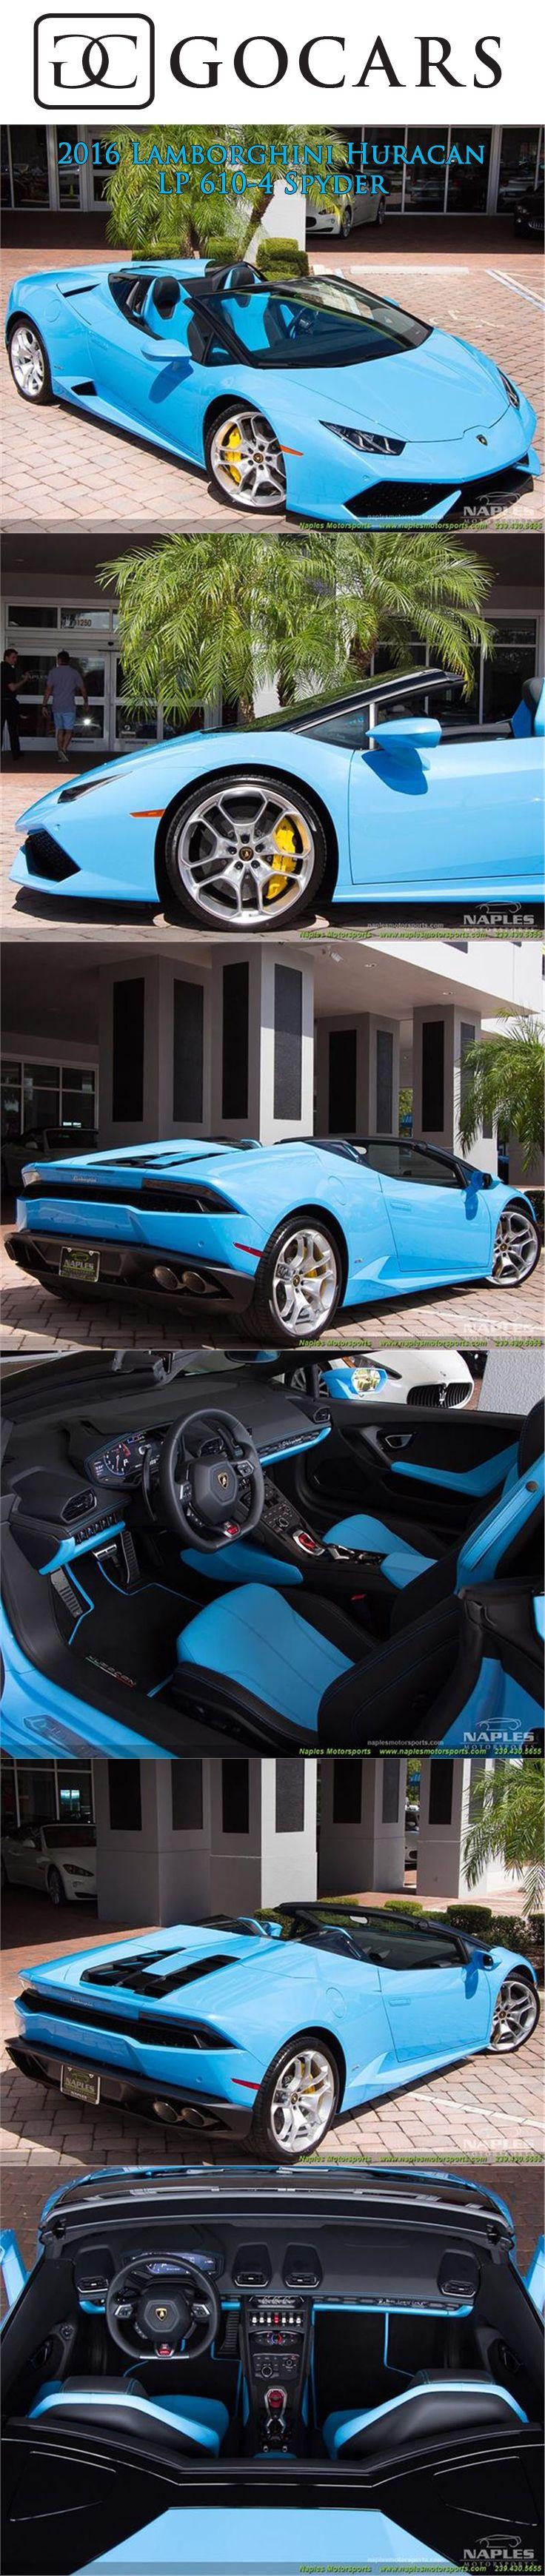 1bf80ef3937516a2be723638358de375--naples-florida-lp Marvelous Lamborghini Huracan Hack asphalt 8 Cars Trend